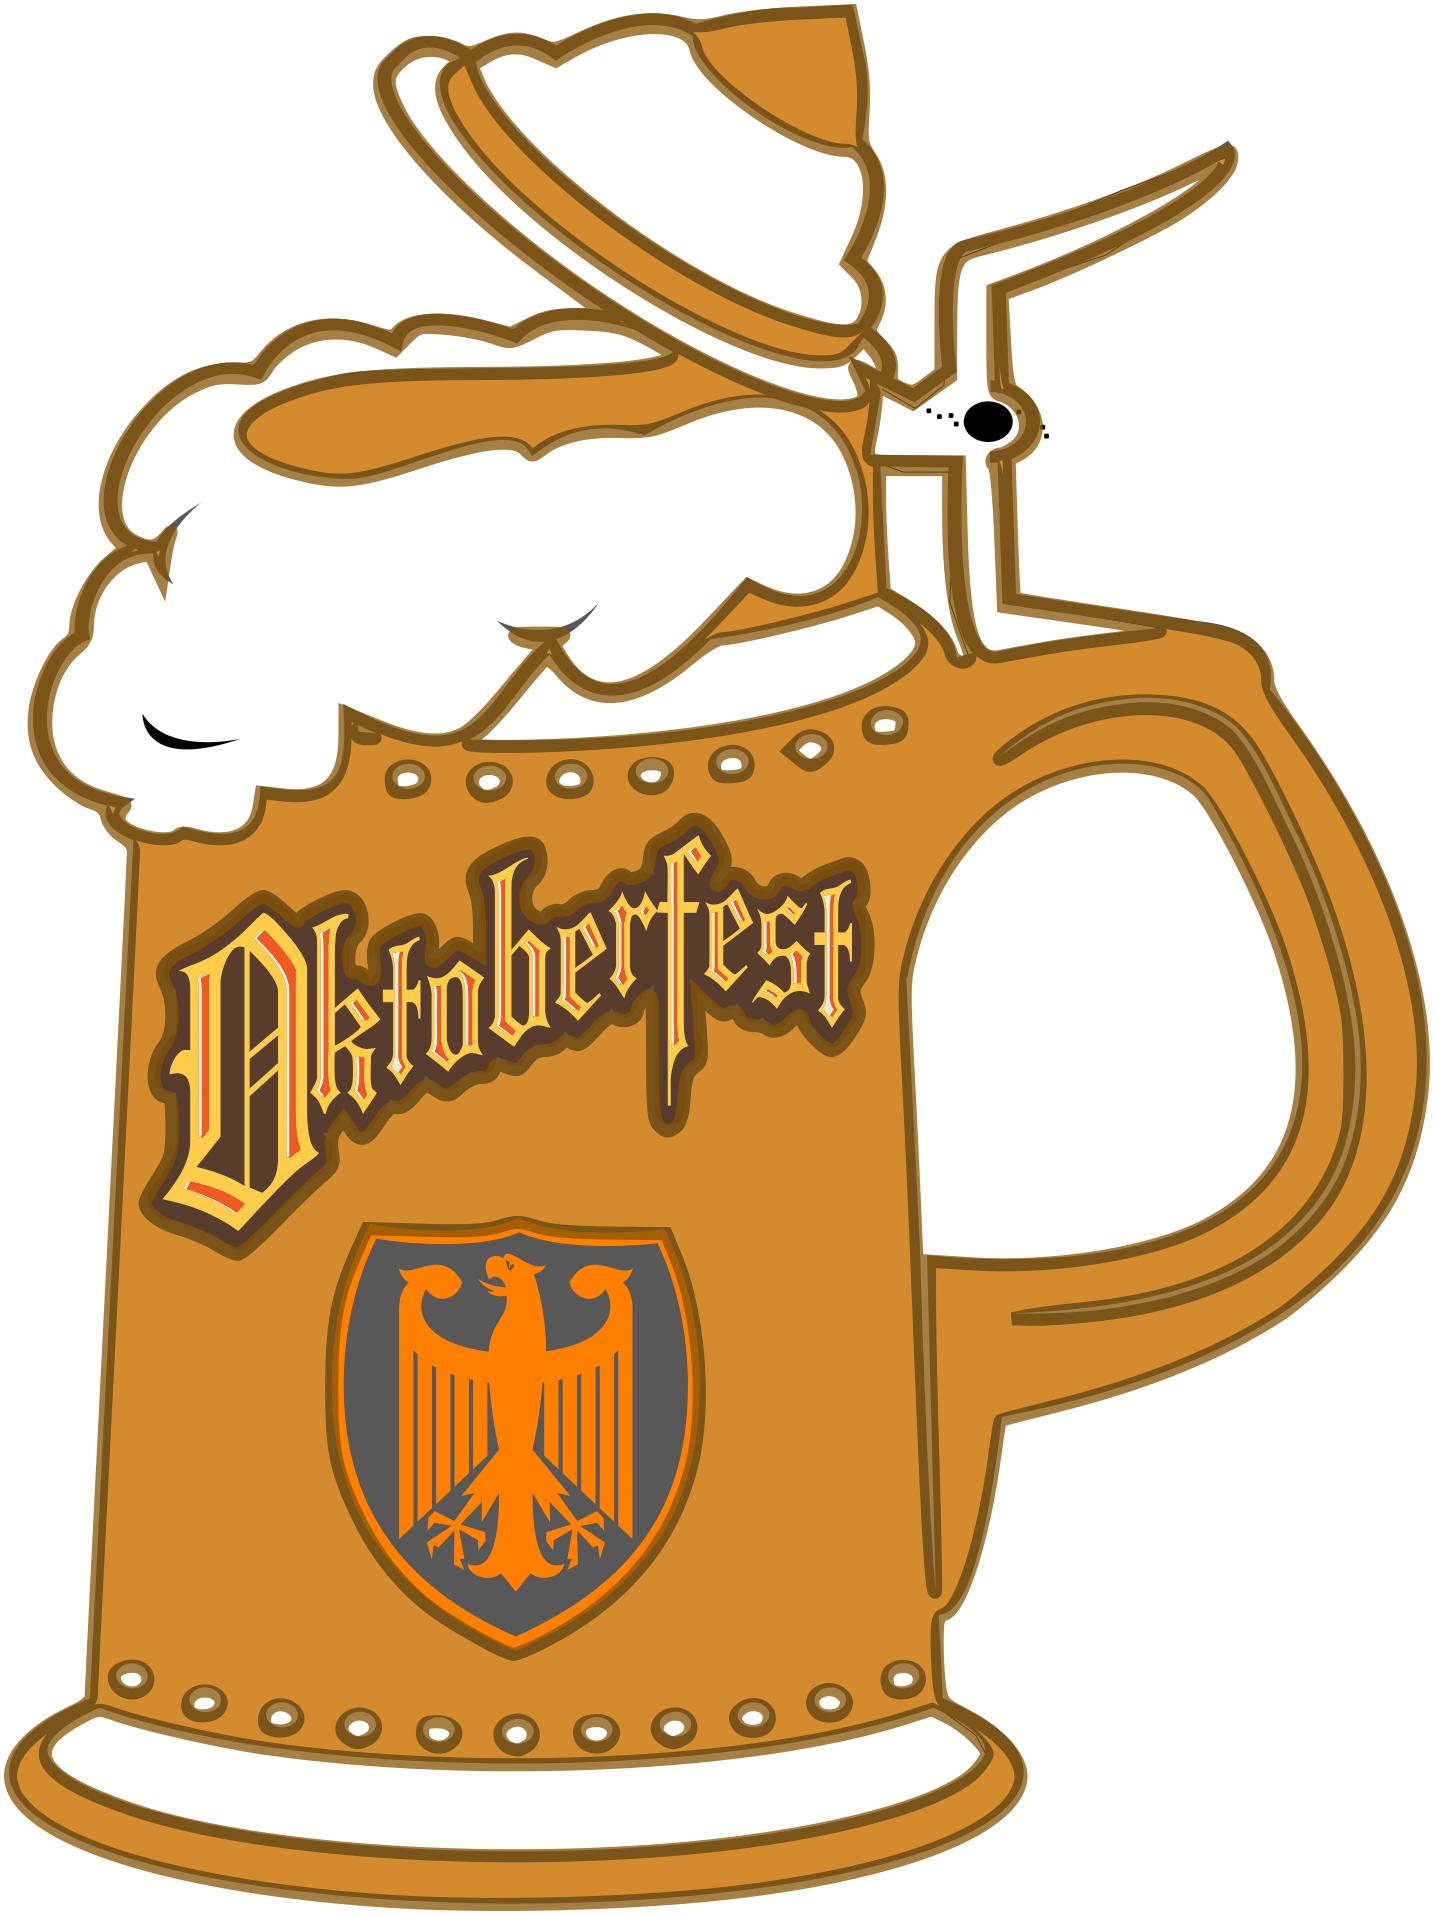 Steins clipart clipart stock Beer Stein Clipart | Free download best Beer Stein Clipart ... clipart stock